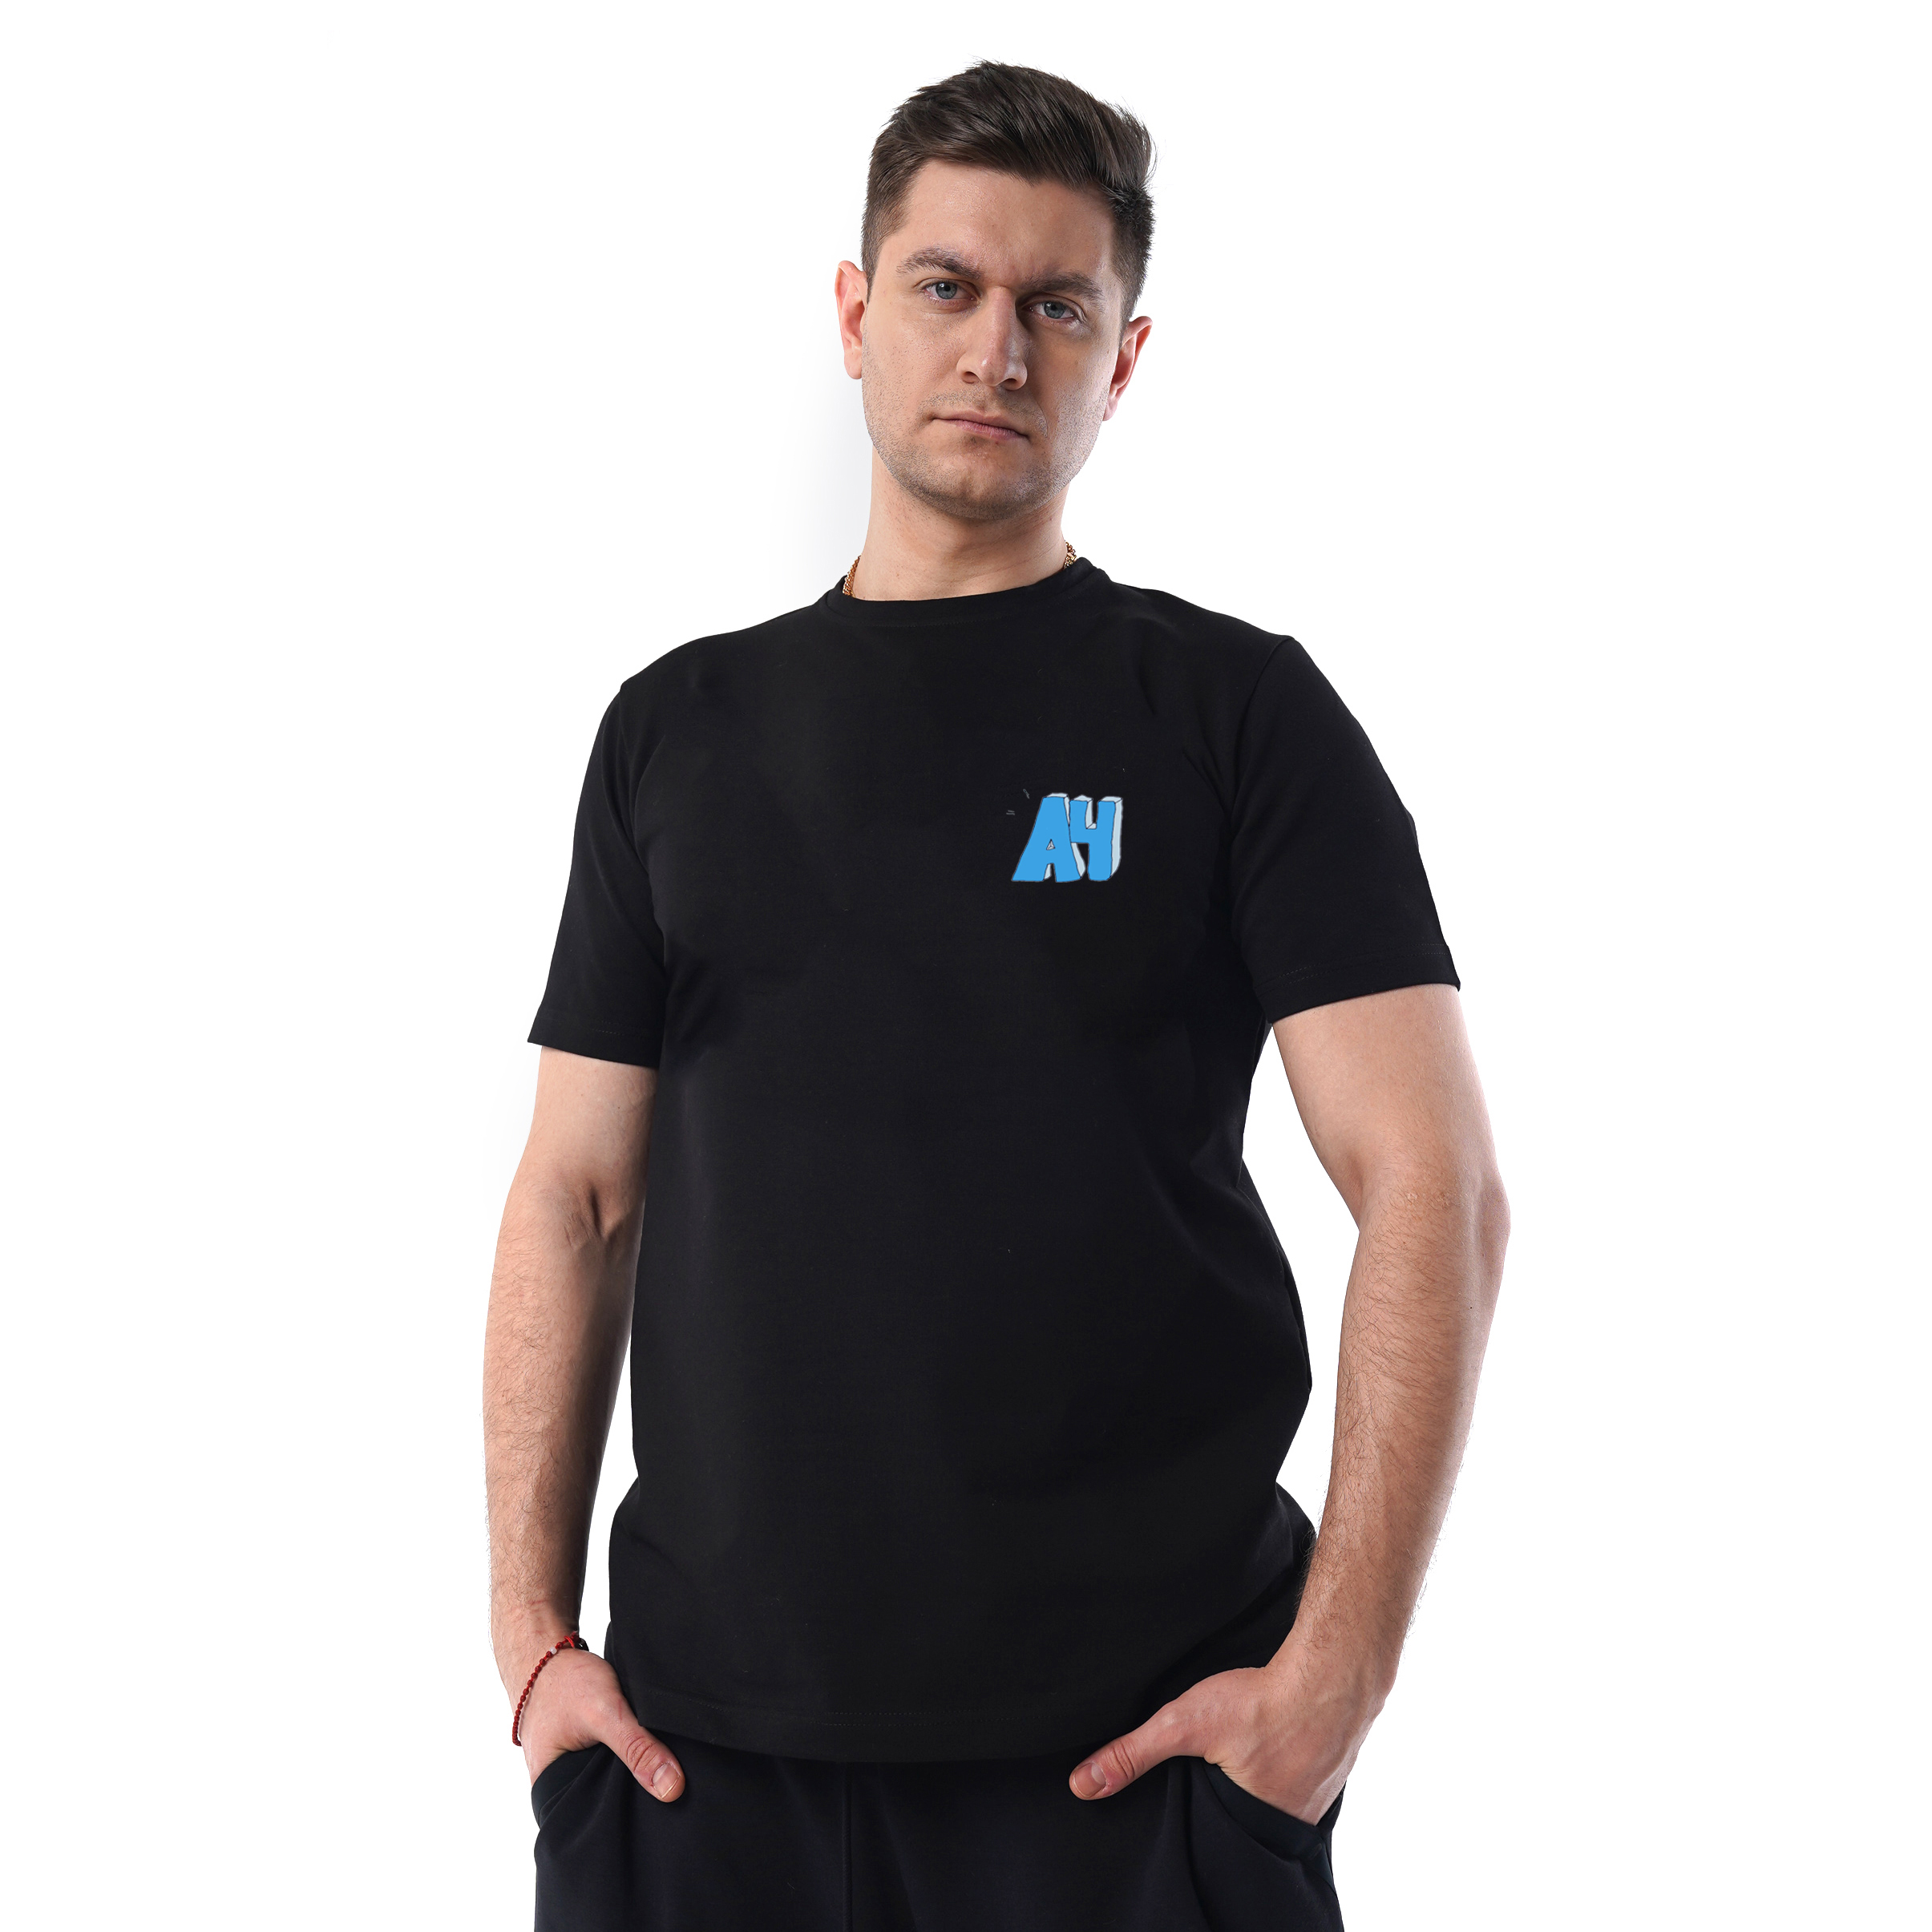 Mens O-neck T Shirts 100% Cotton Merch а4 Paper Casual Fashion Men's Tops Men T-shirt Short Sleeve Men мерч A4 Tshirts